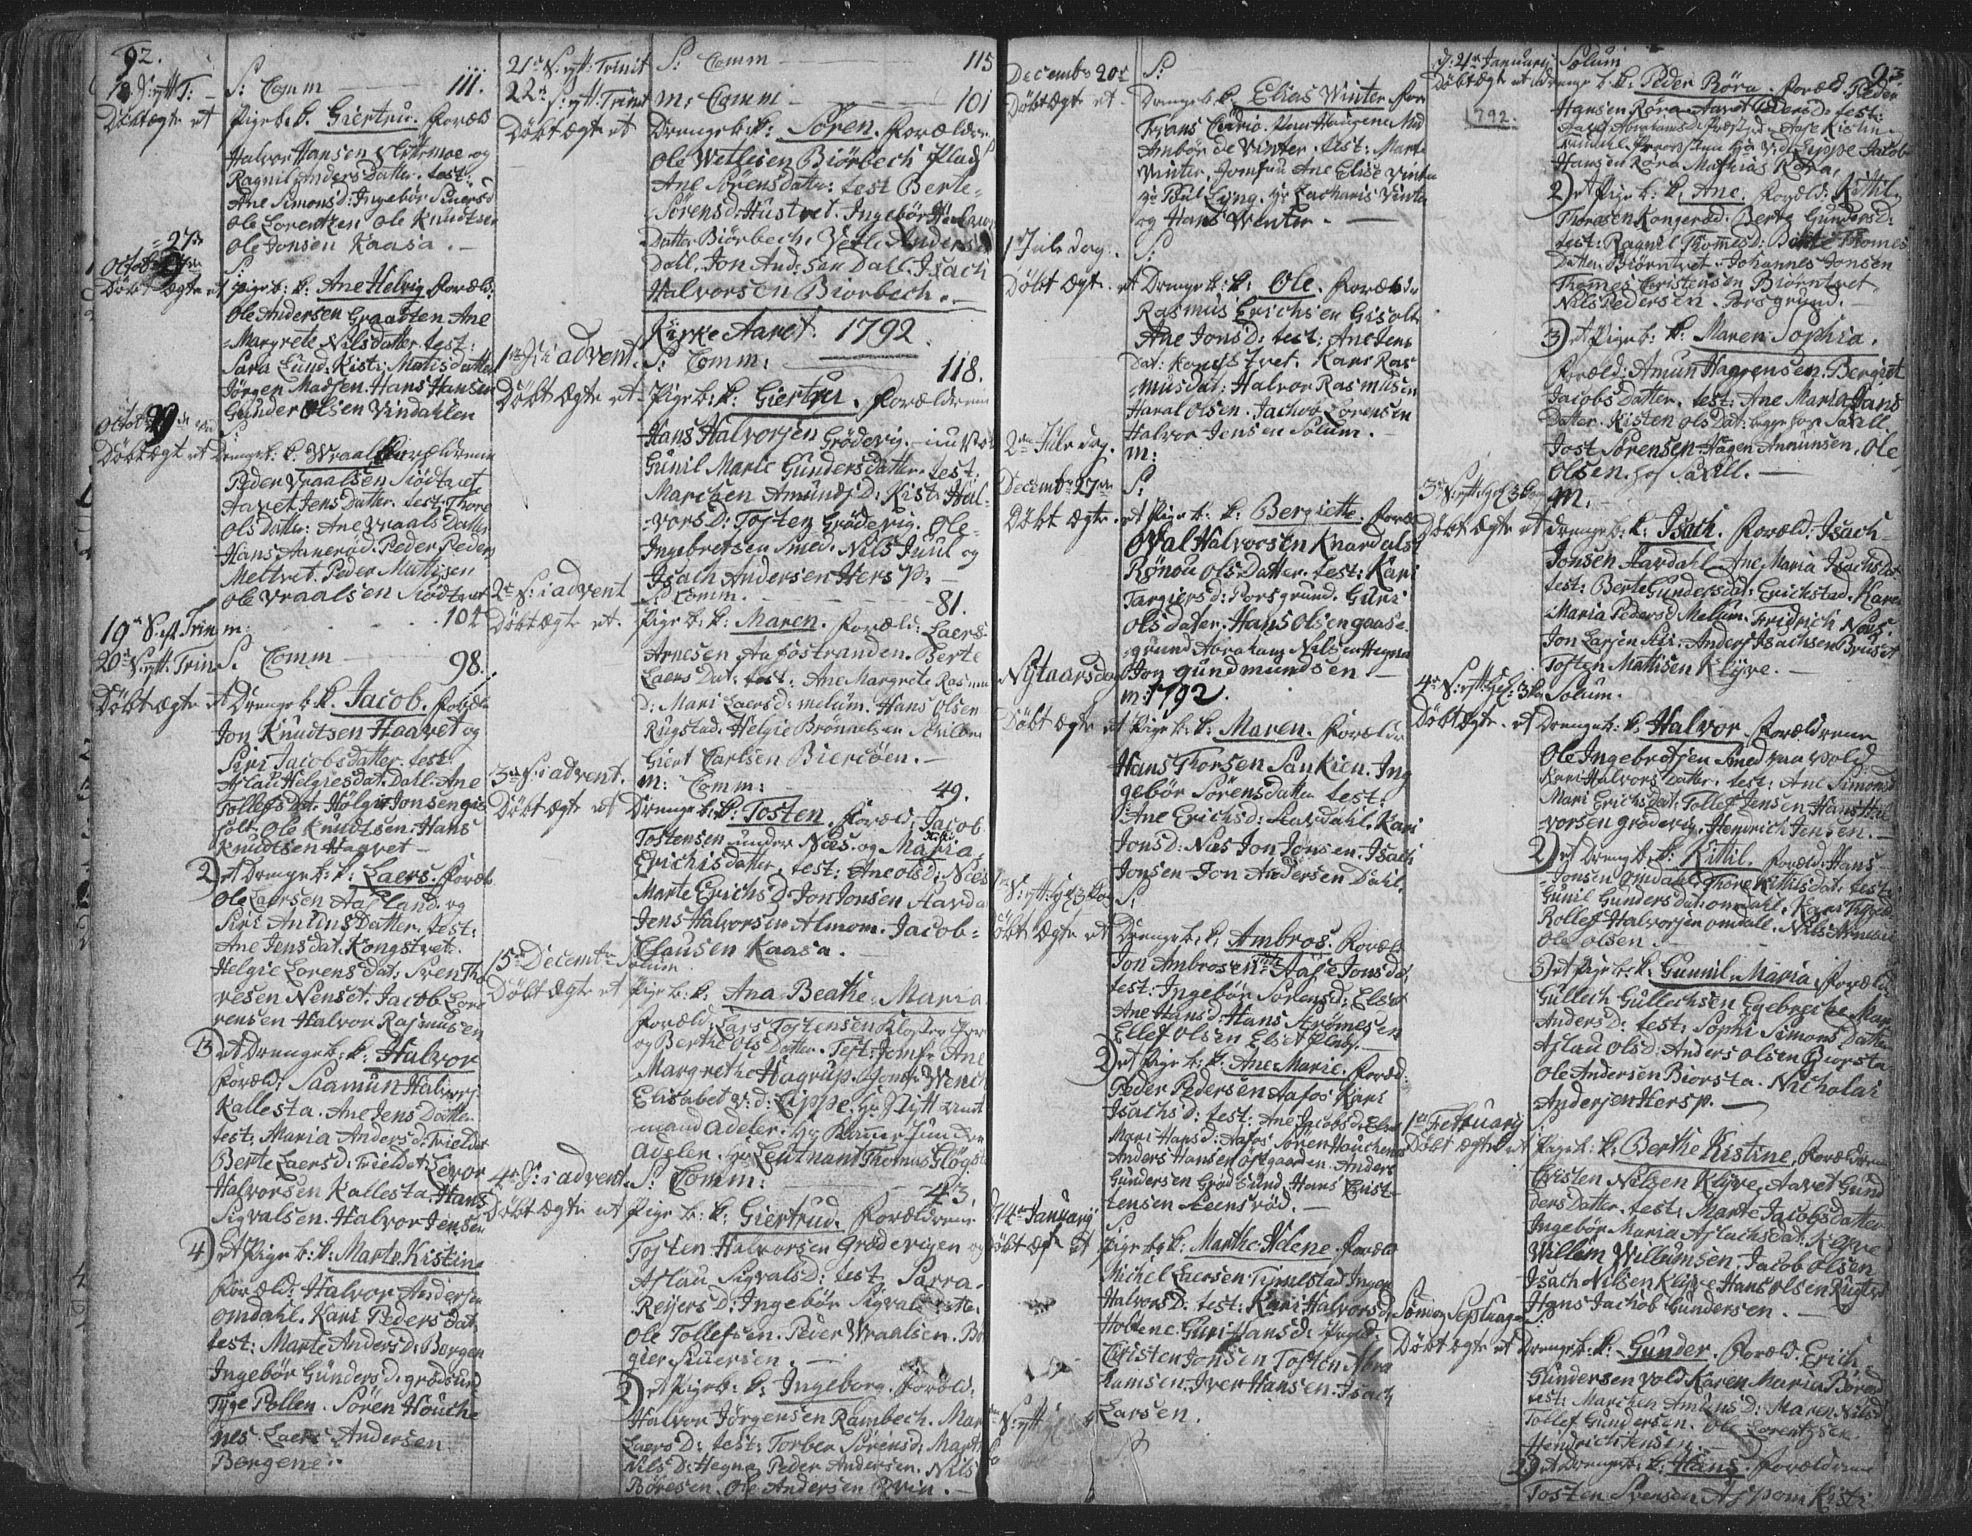 SAKO, Solum kirkebøker, F/Fa/L0003: Ministerialbok nr. I 3, 1761-1814, s. 92-93